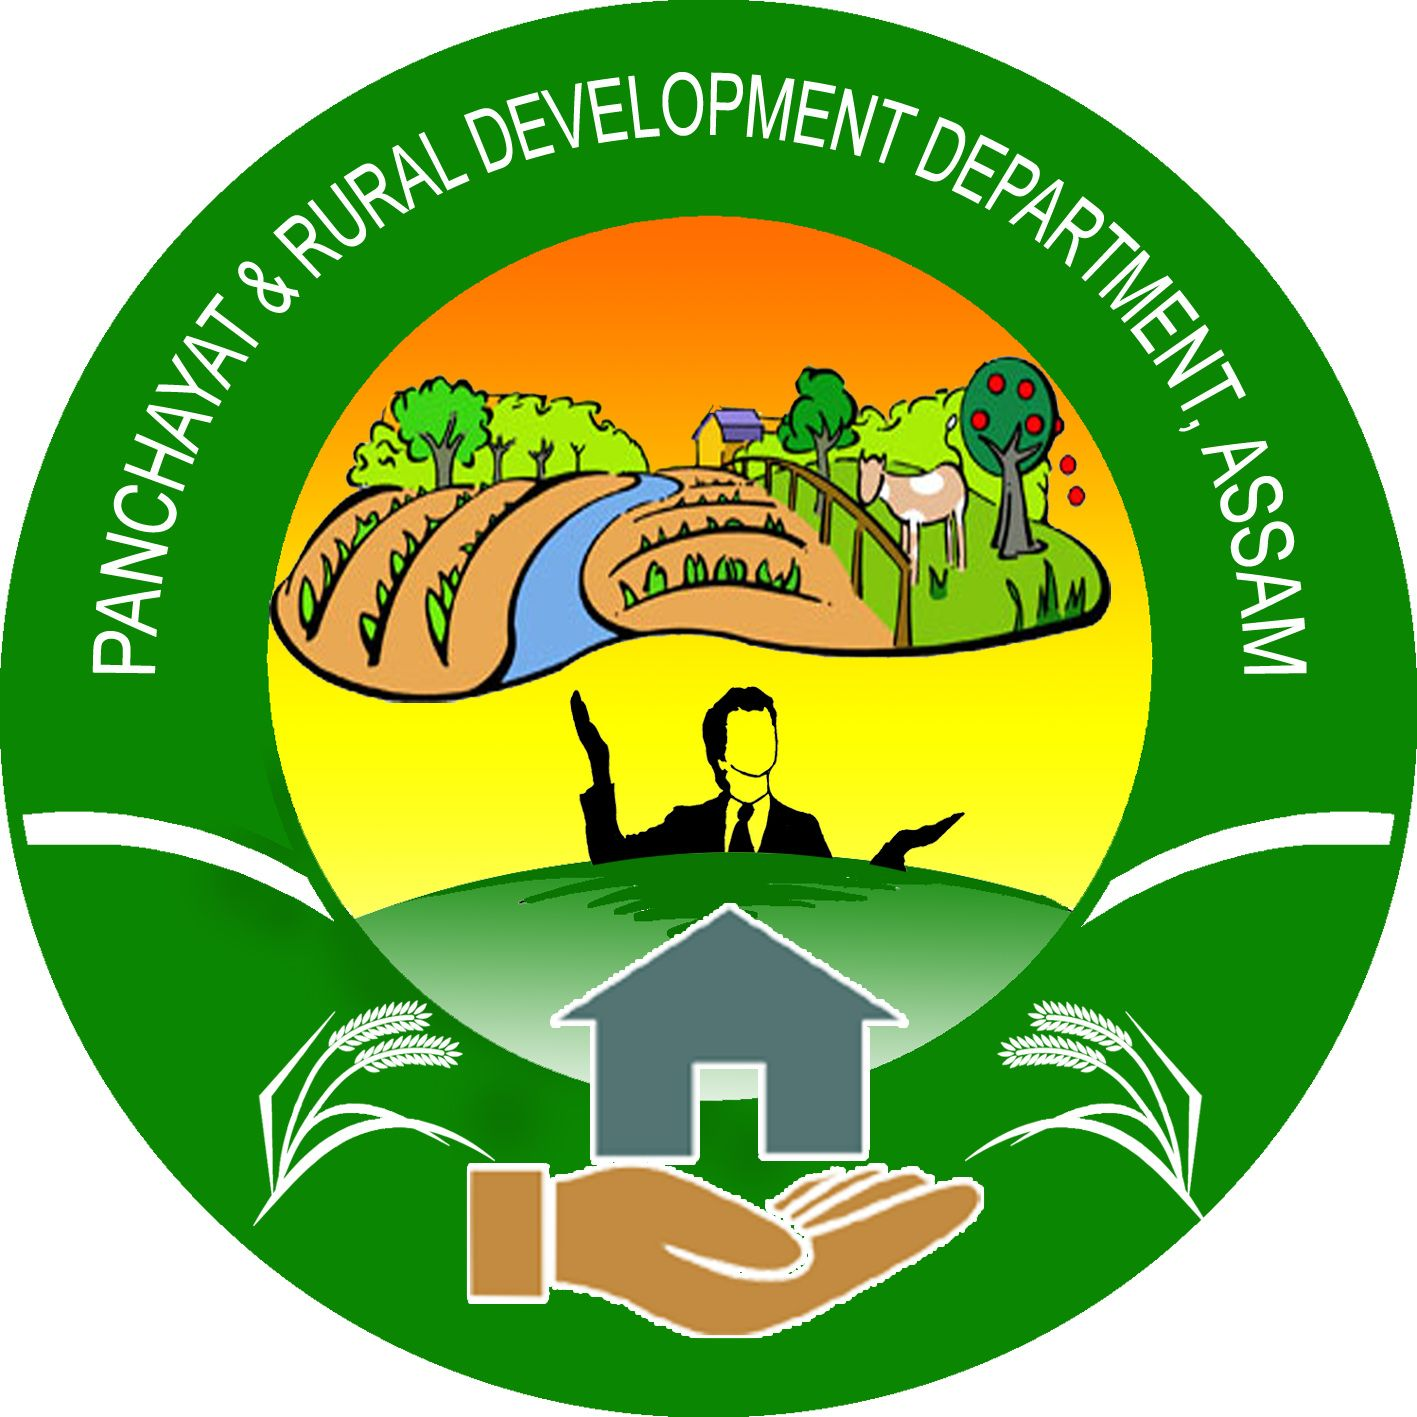 Related image Recruitment, Development, Civil society